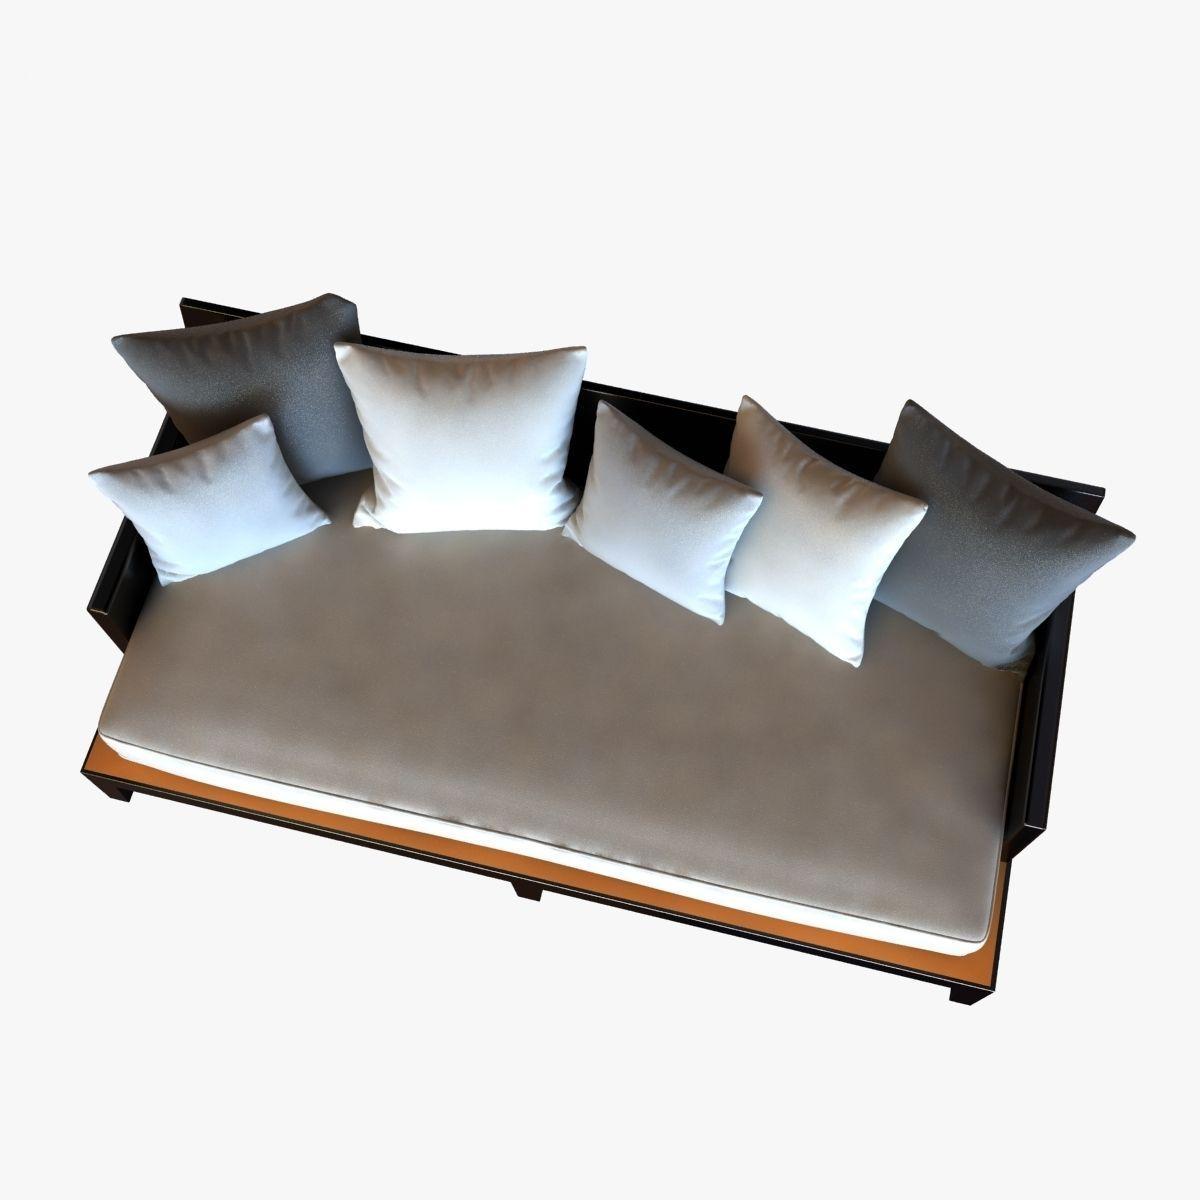 christian liaigre sofa for holly hunt opium 3D Model x